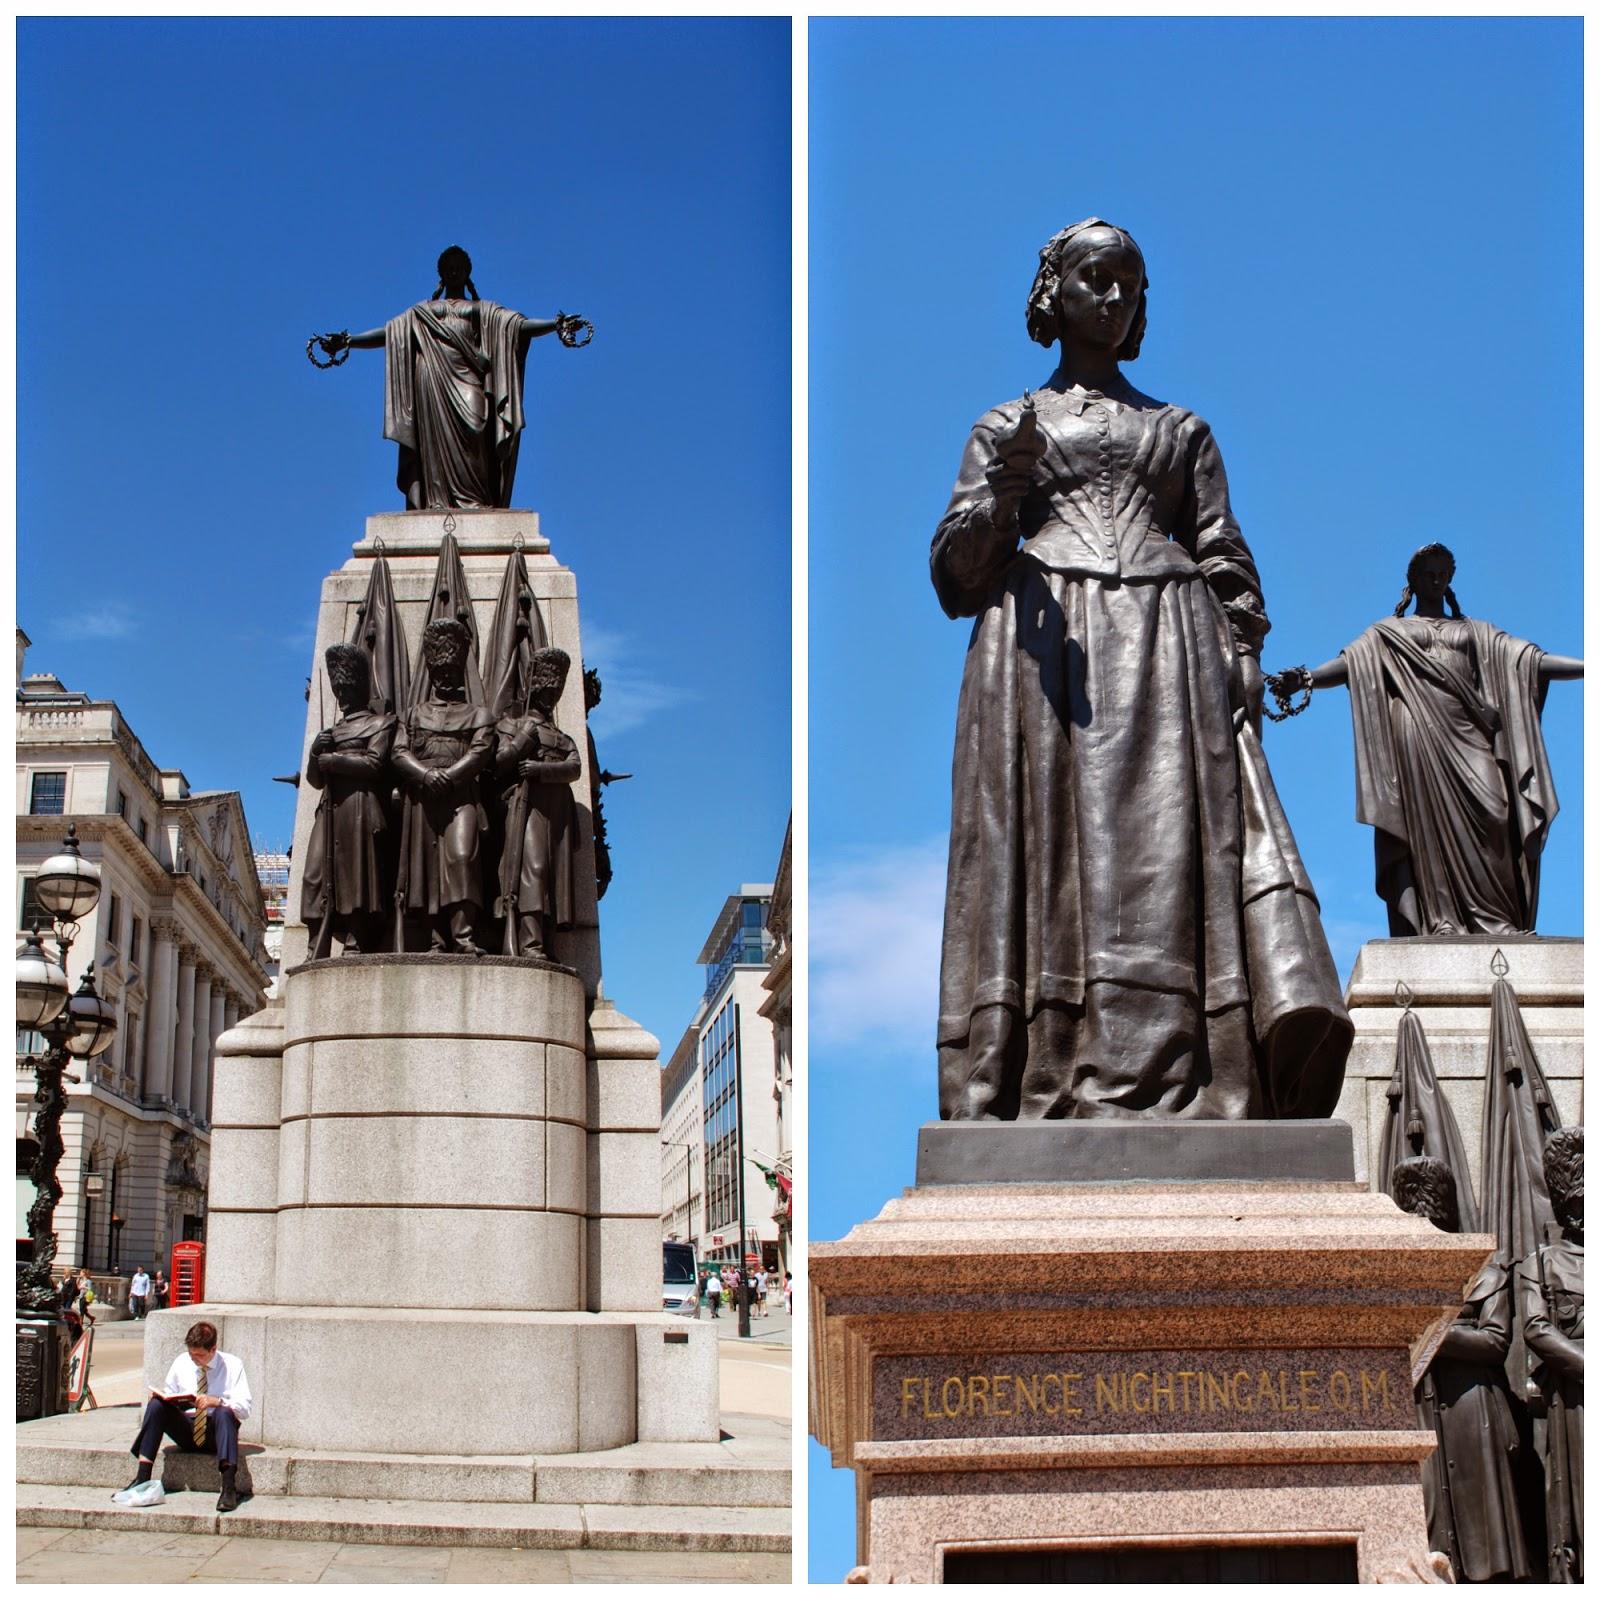 Waterloo Place, London